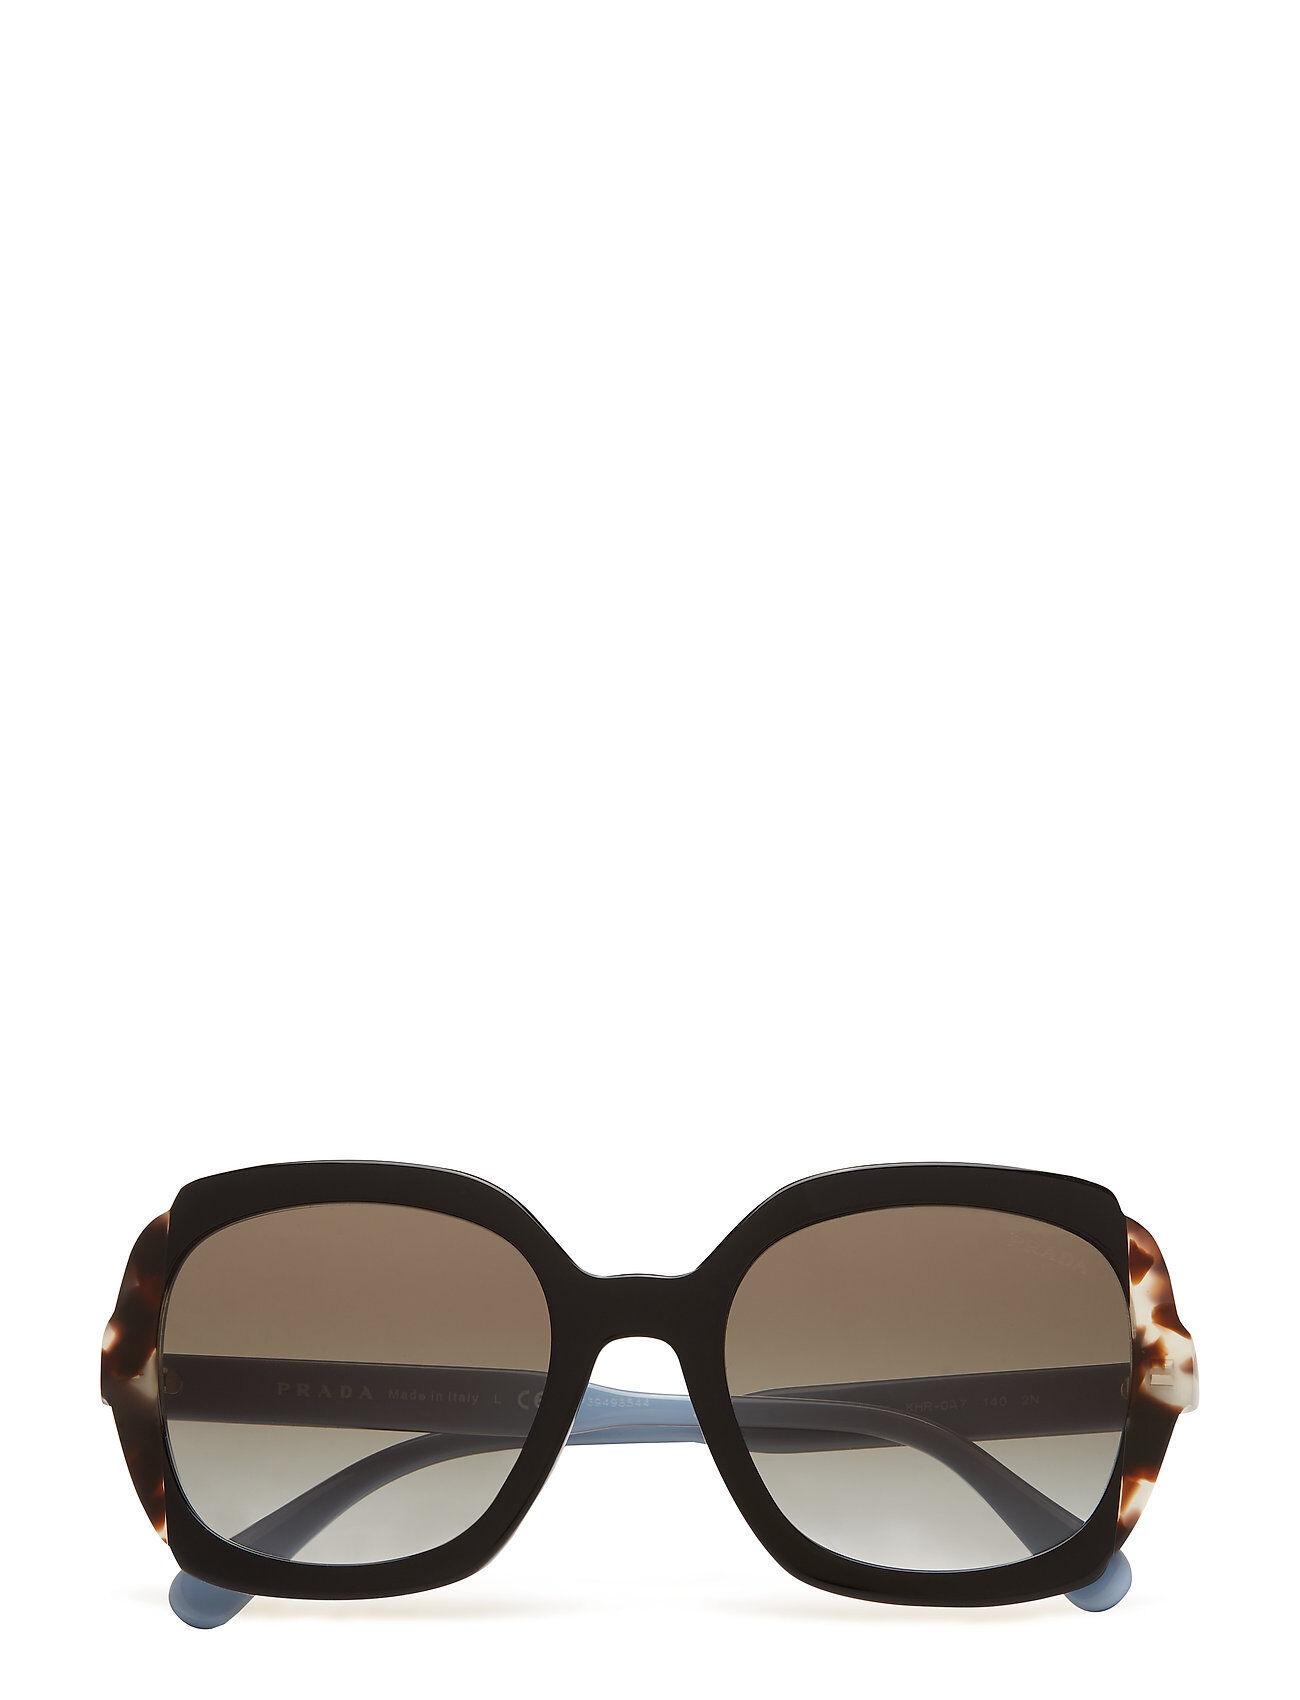 Image of Prada Sunglasses 0pr 16us Wayfarer Aurinkolasit Musta Prada Sunglasses